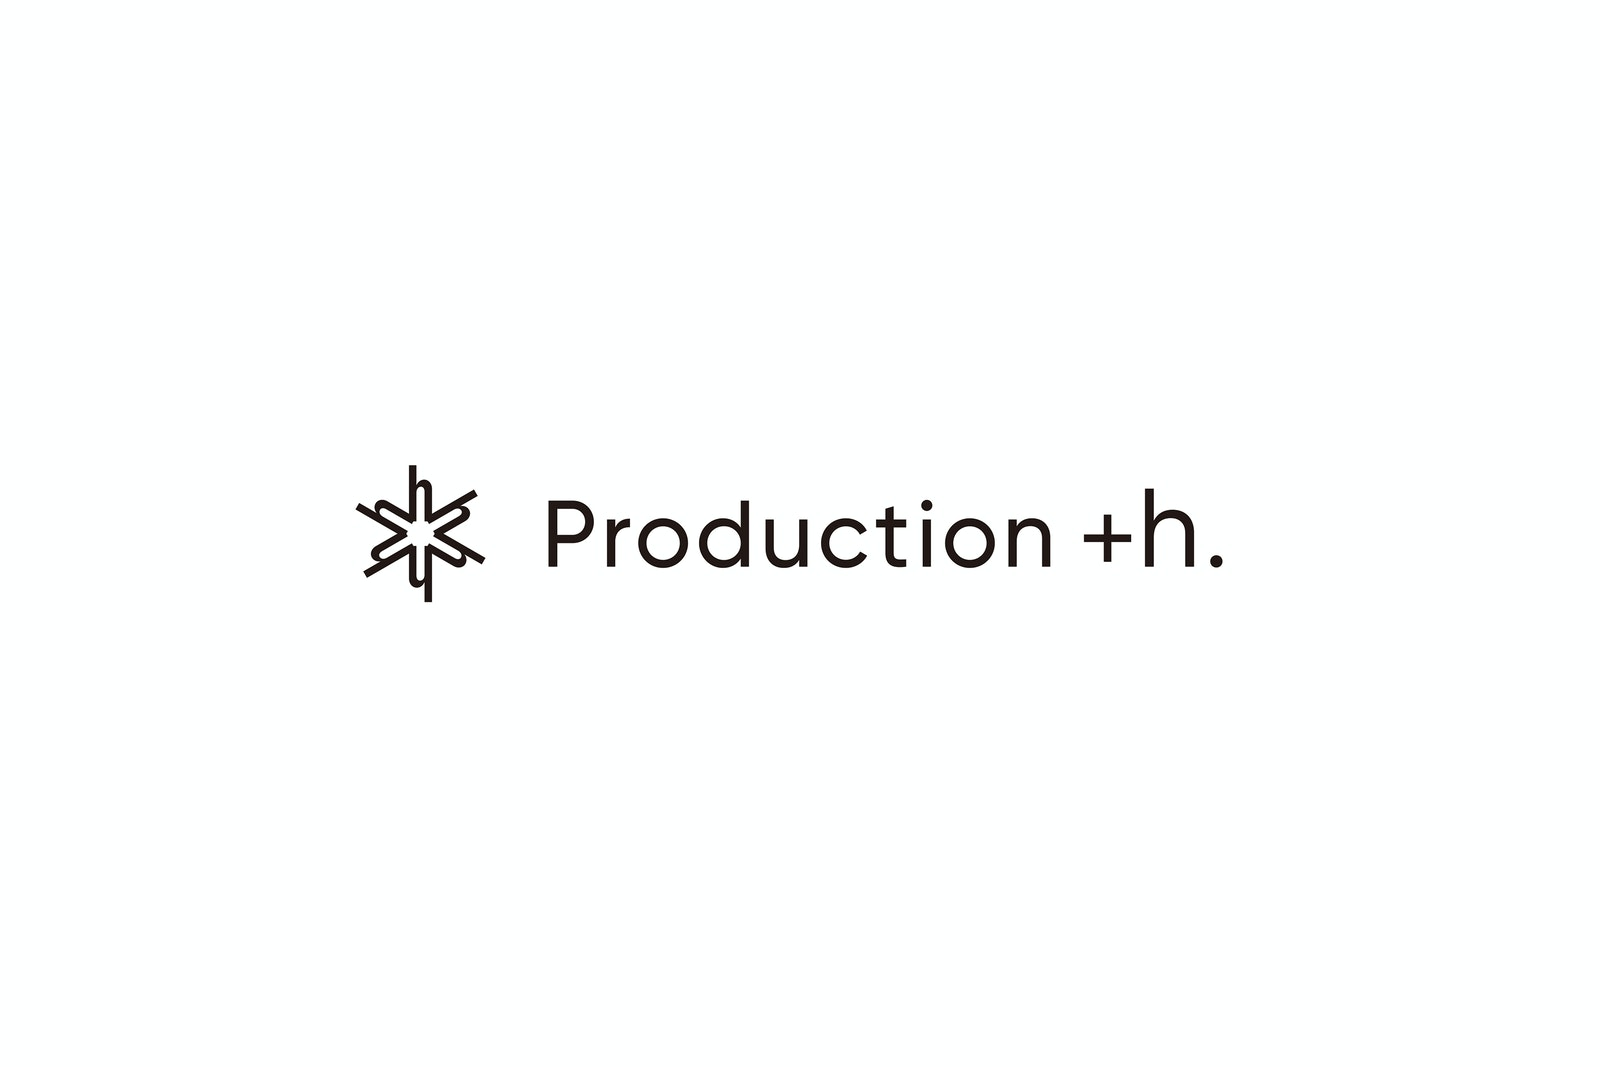 Production +h.